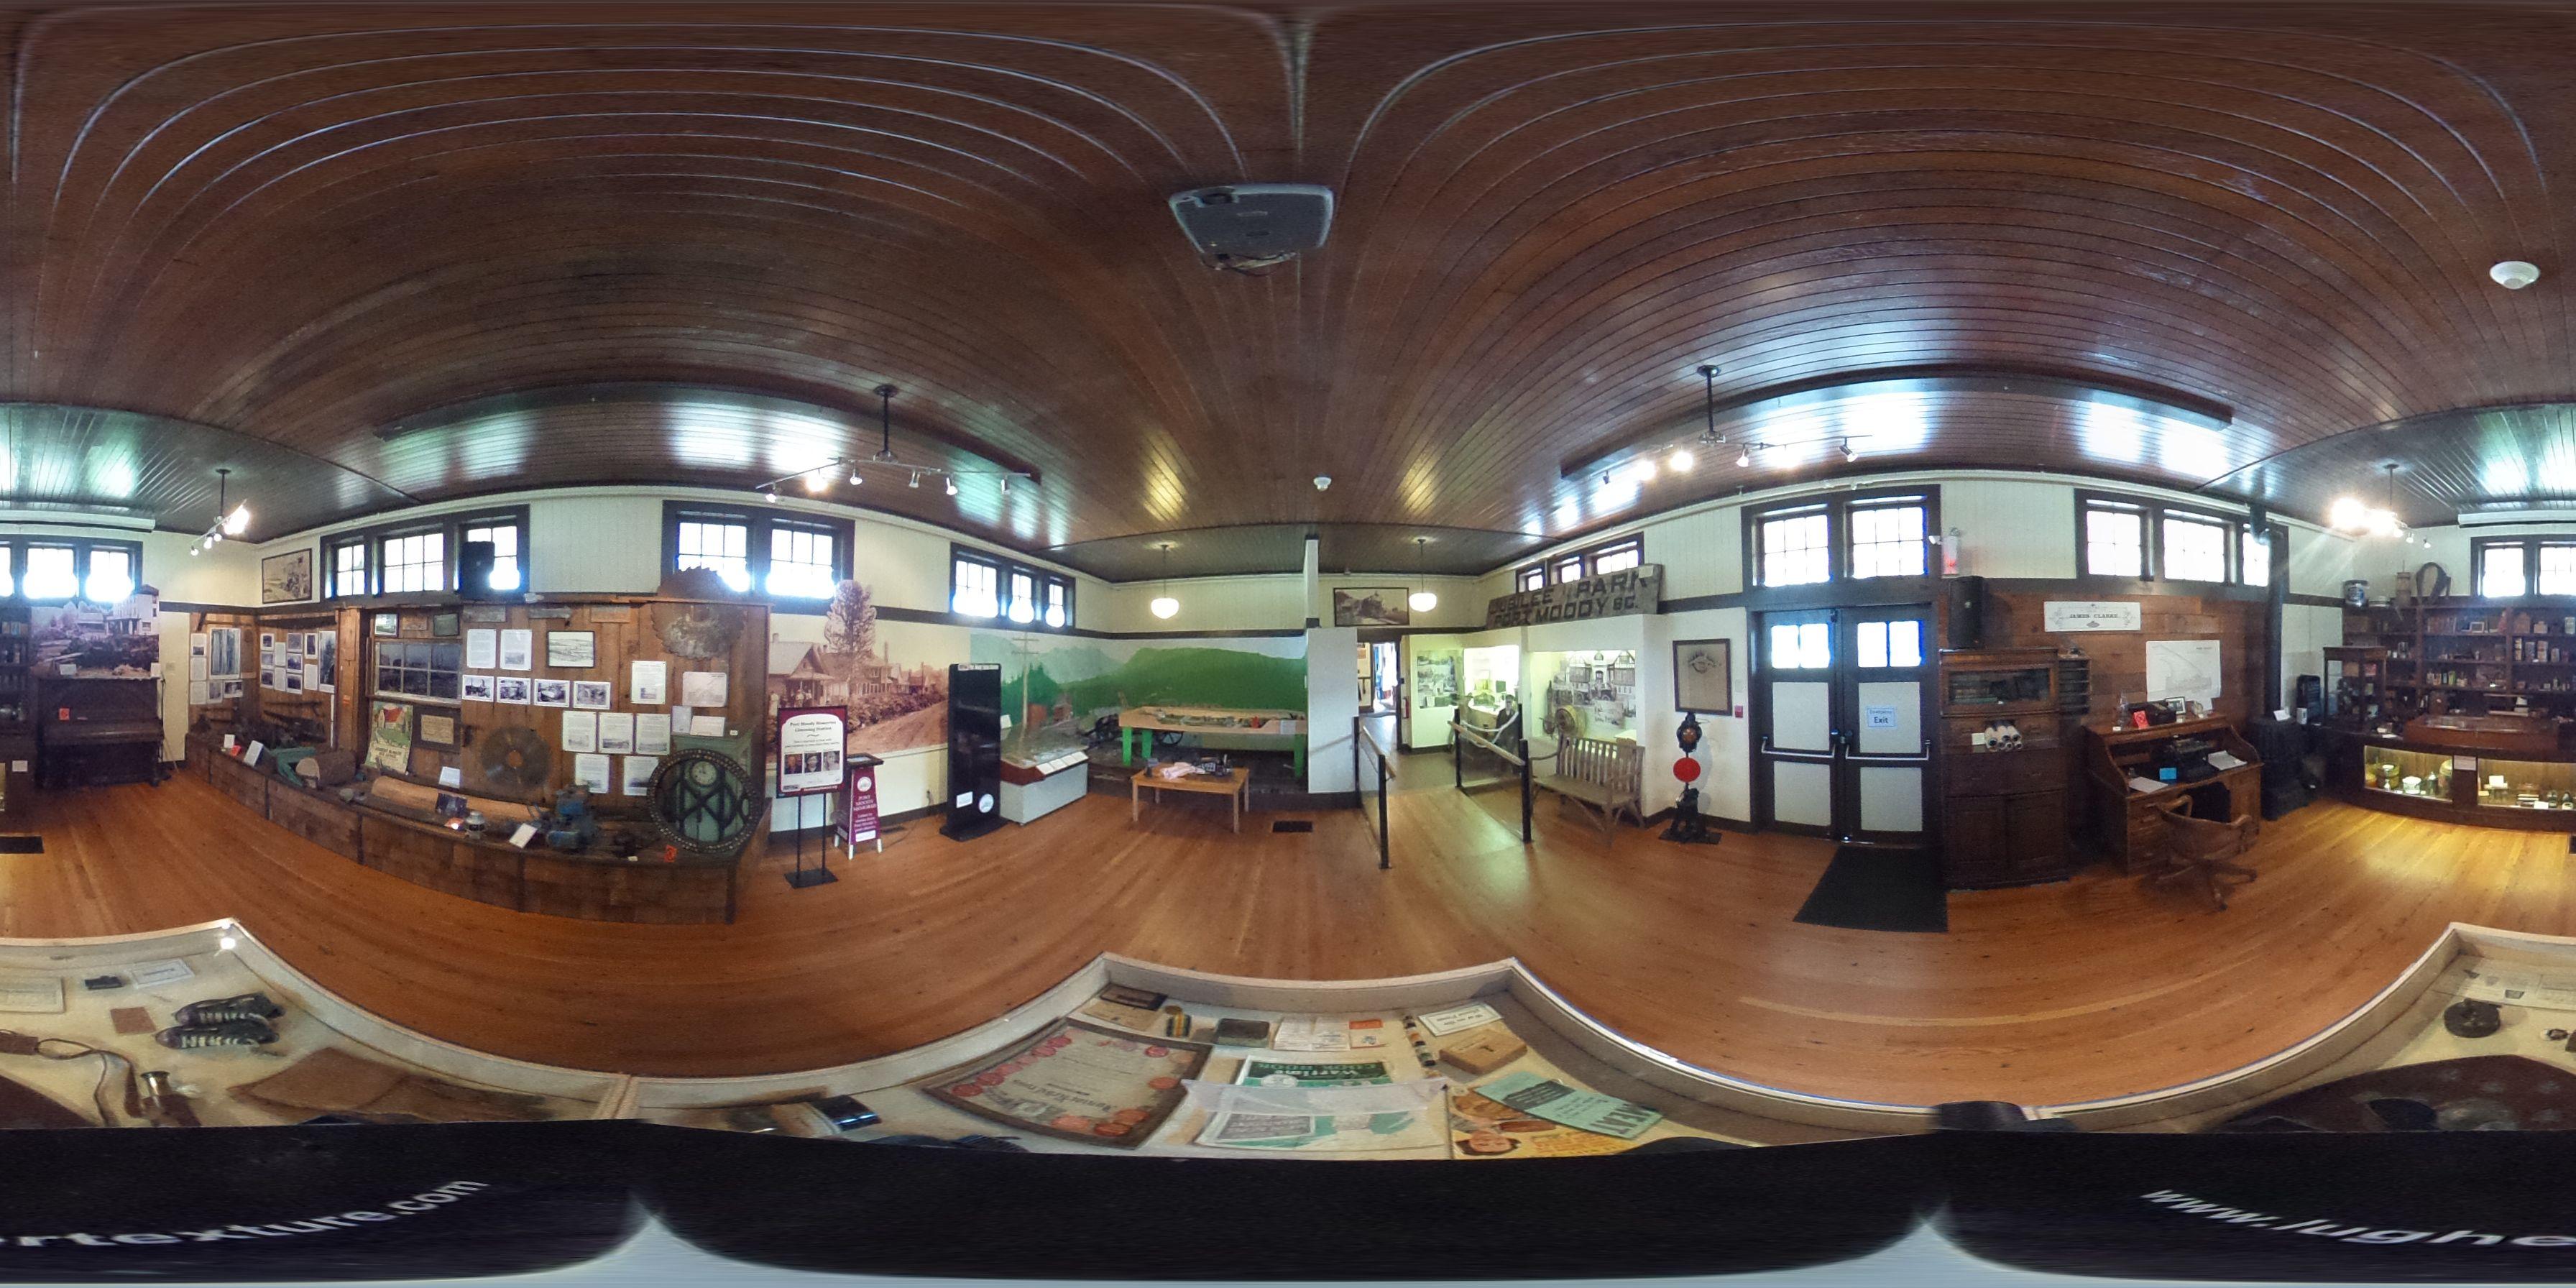 Room Decorating Simulator Pin By Destiny Leistner On Hdri Pinterest Searching